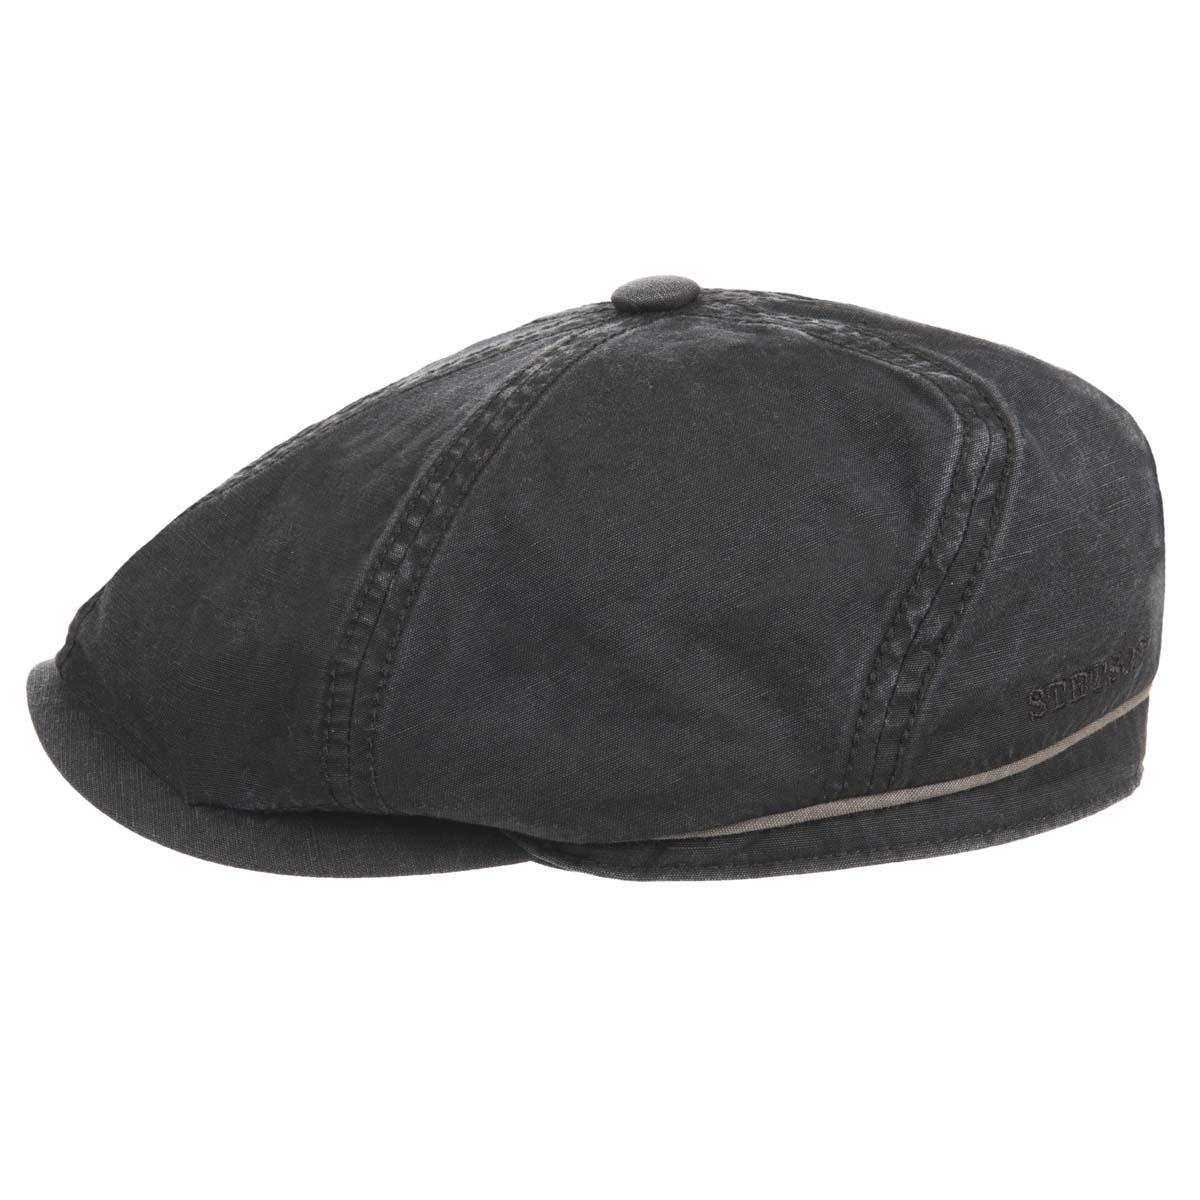 272c52986ed Trendy flat cap signed Stetson